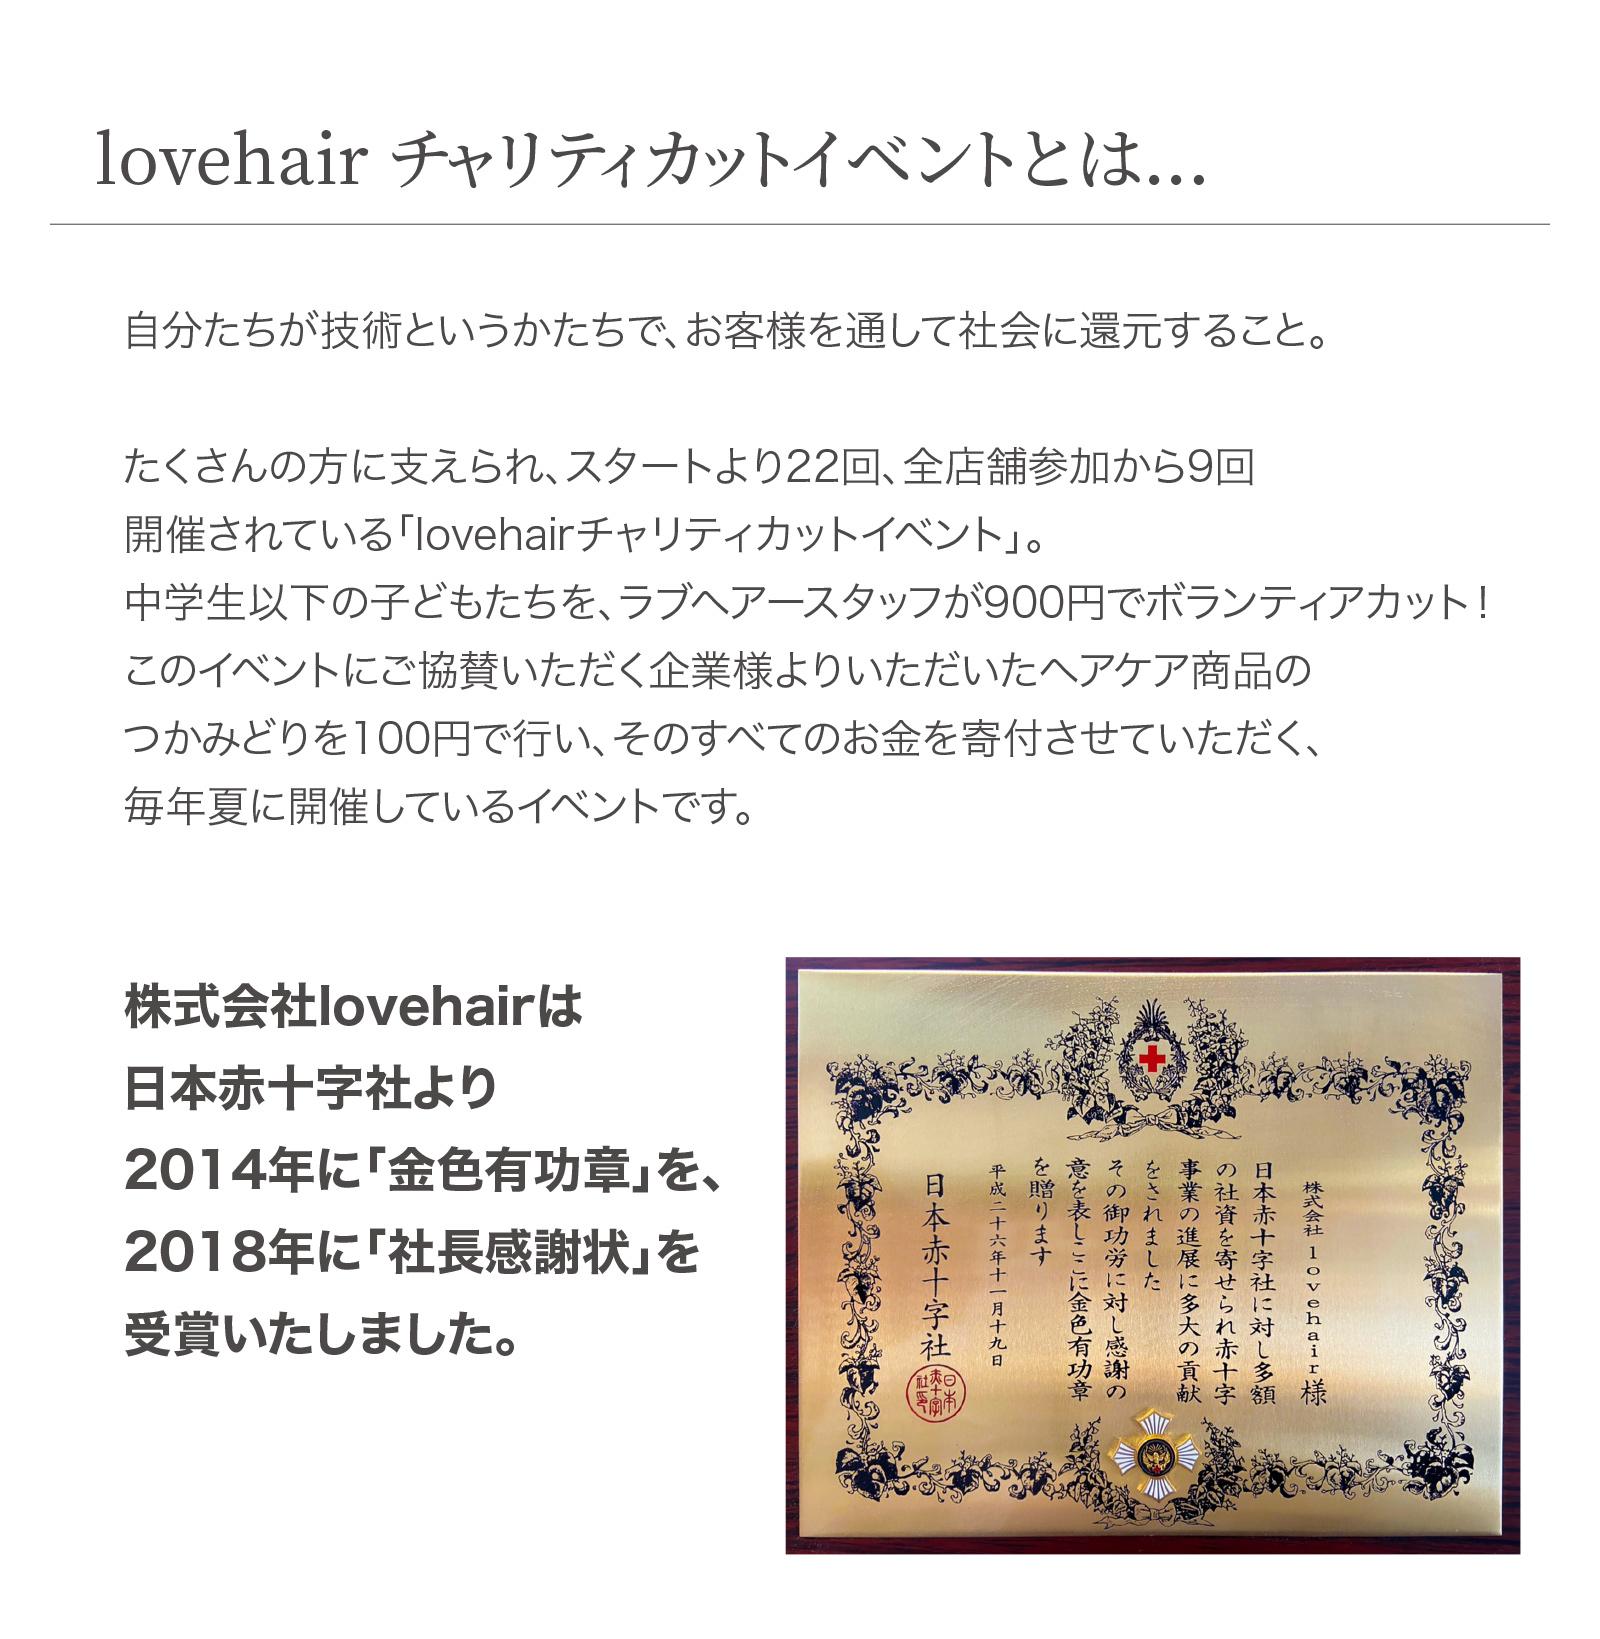 lovehair | チャリティ | 寄付 | 美容室